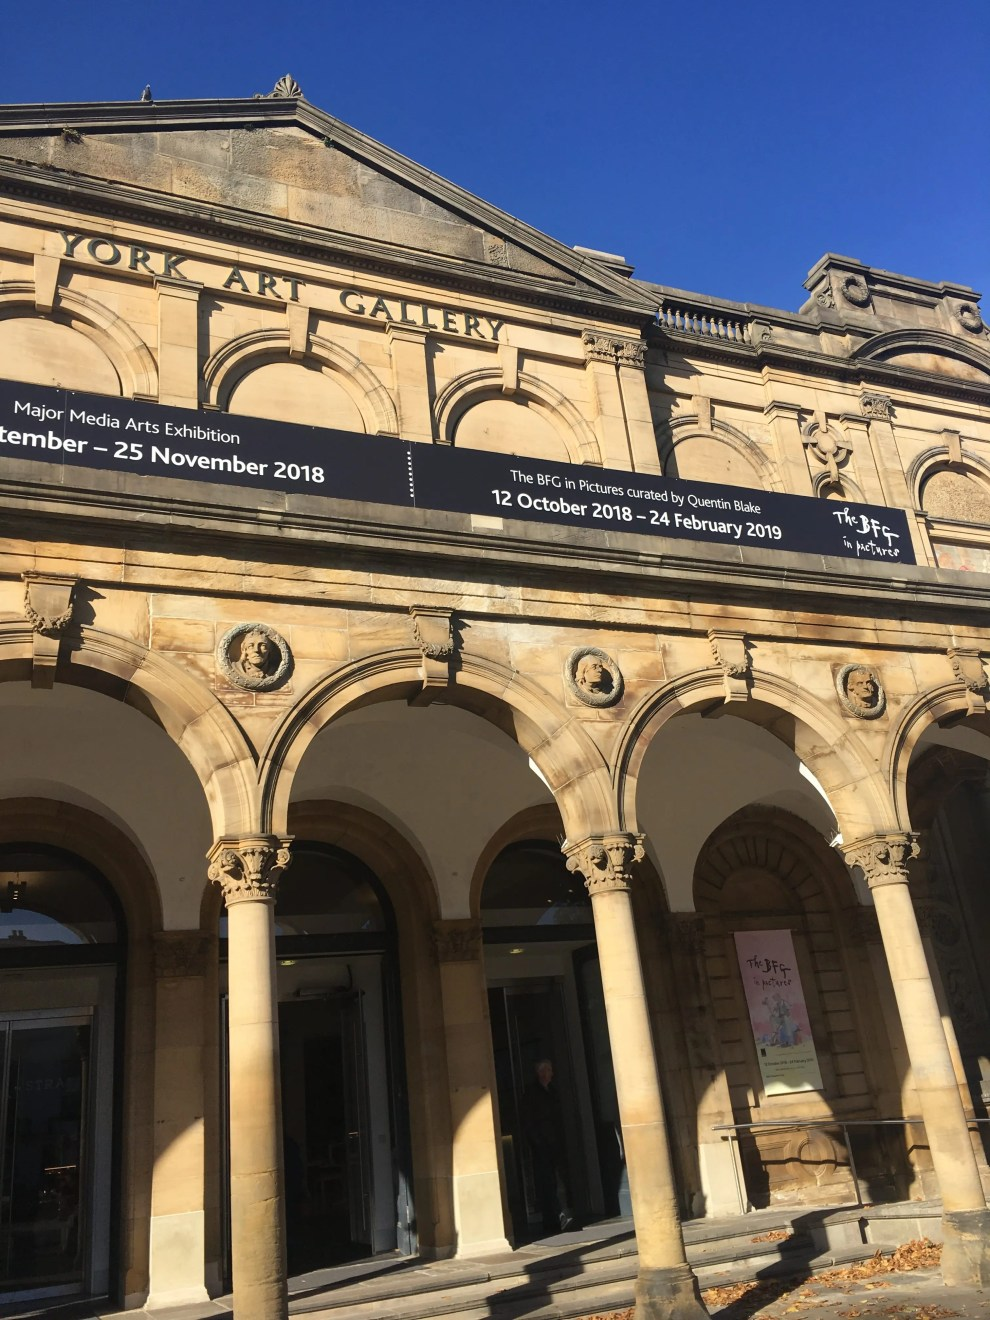 York Art Gallery - A Day Trip To York